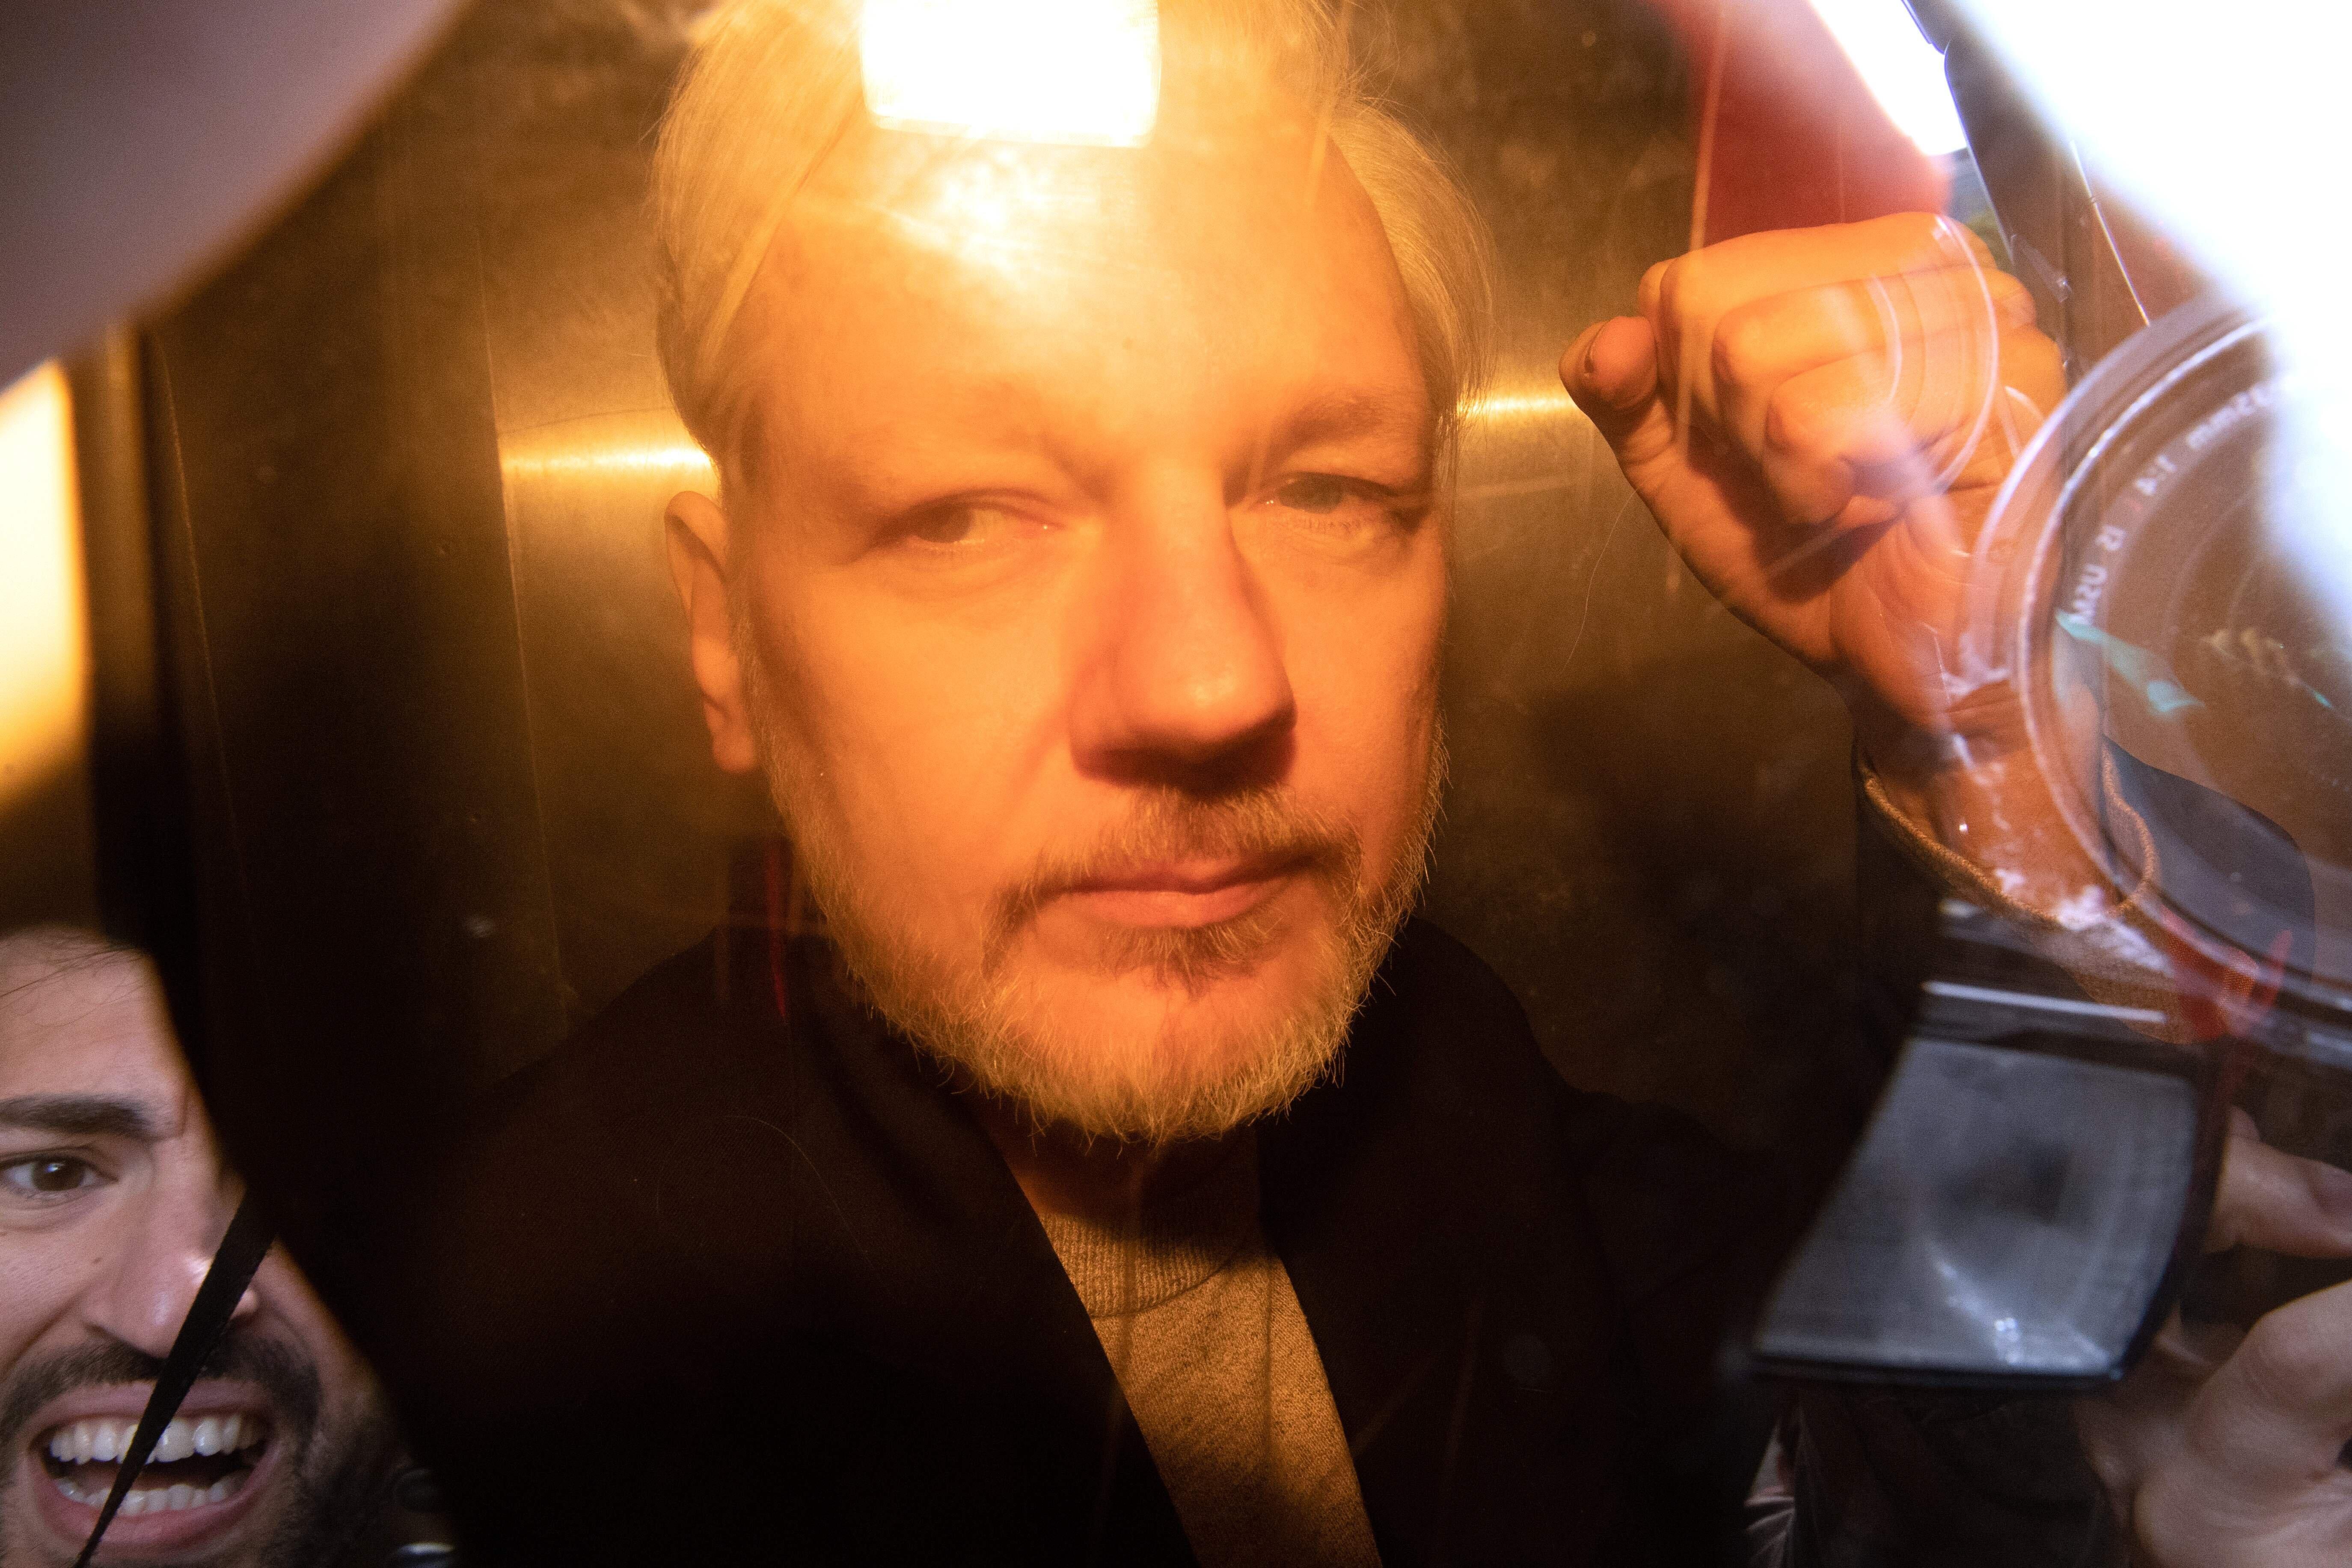 Julian Assange Sentenced To 50 Weeks In Jail For Breaching Bail